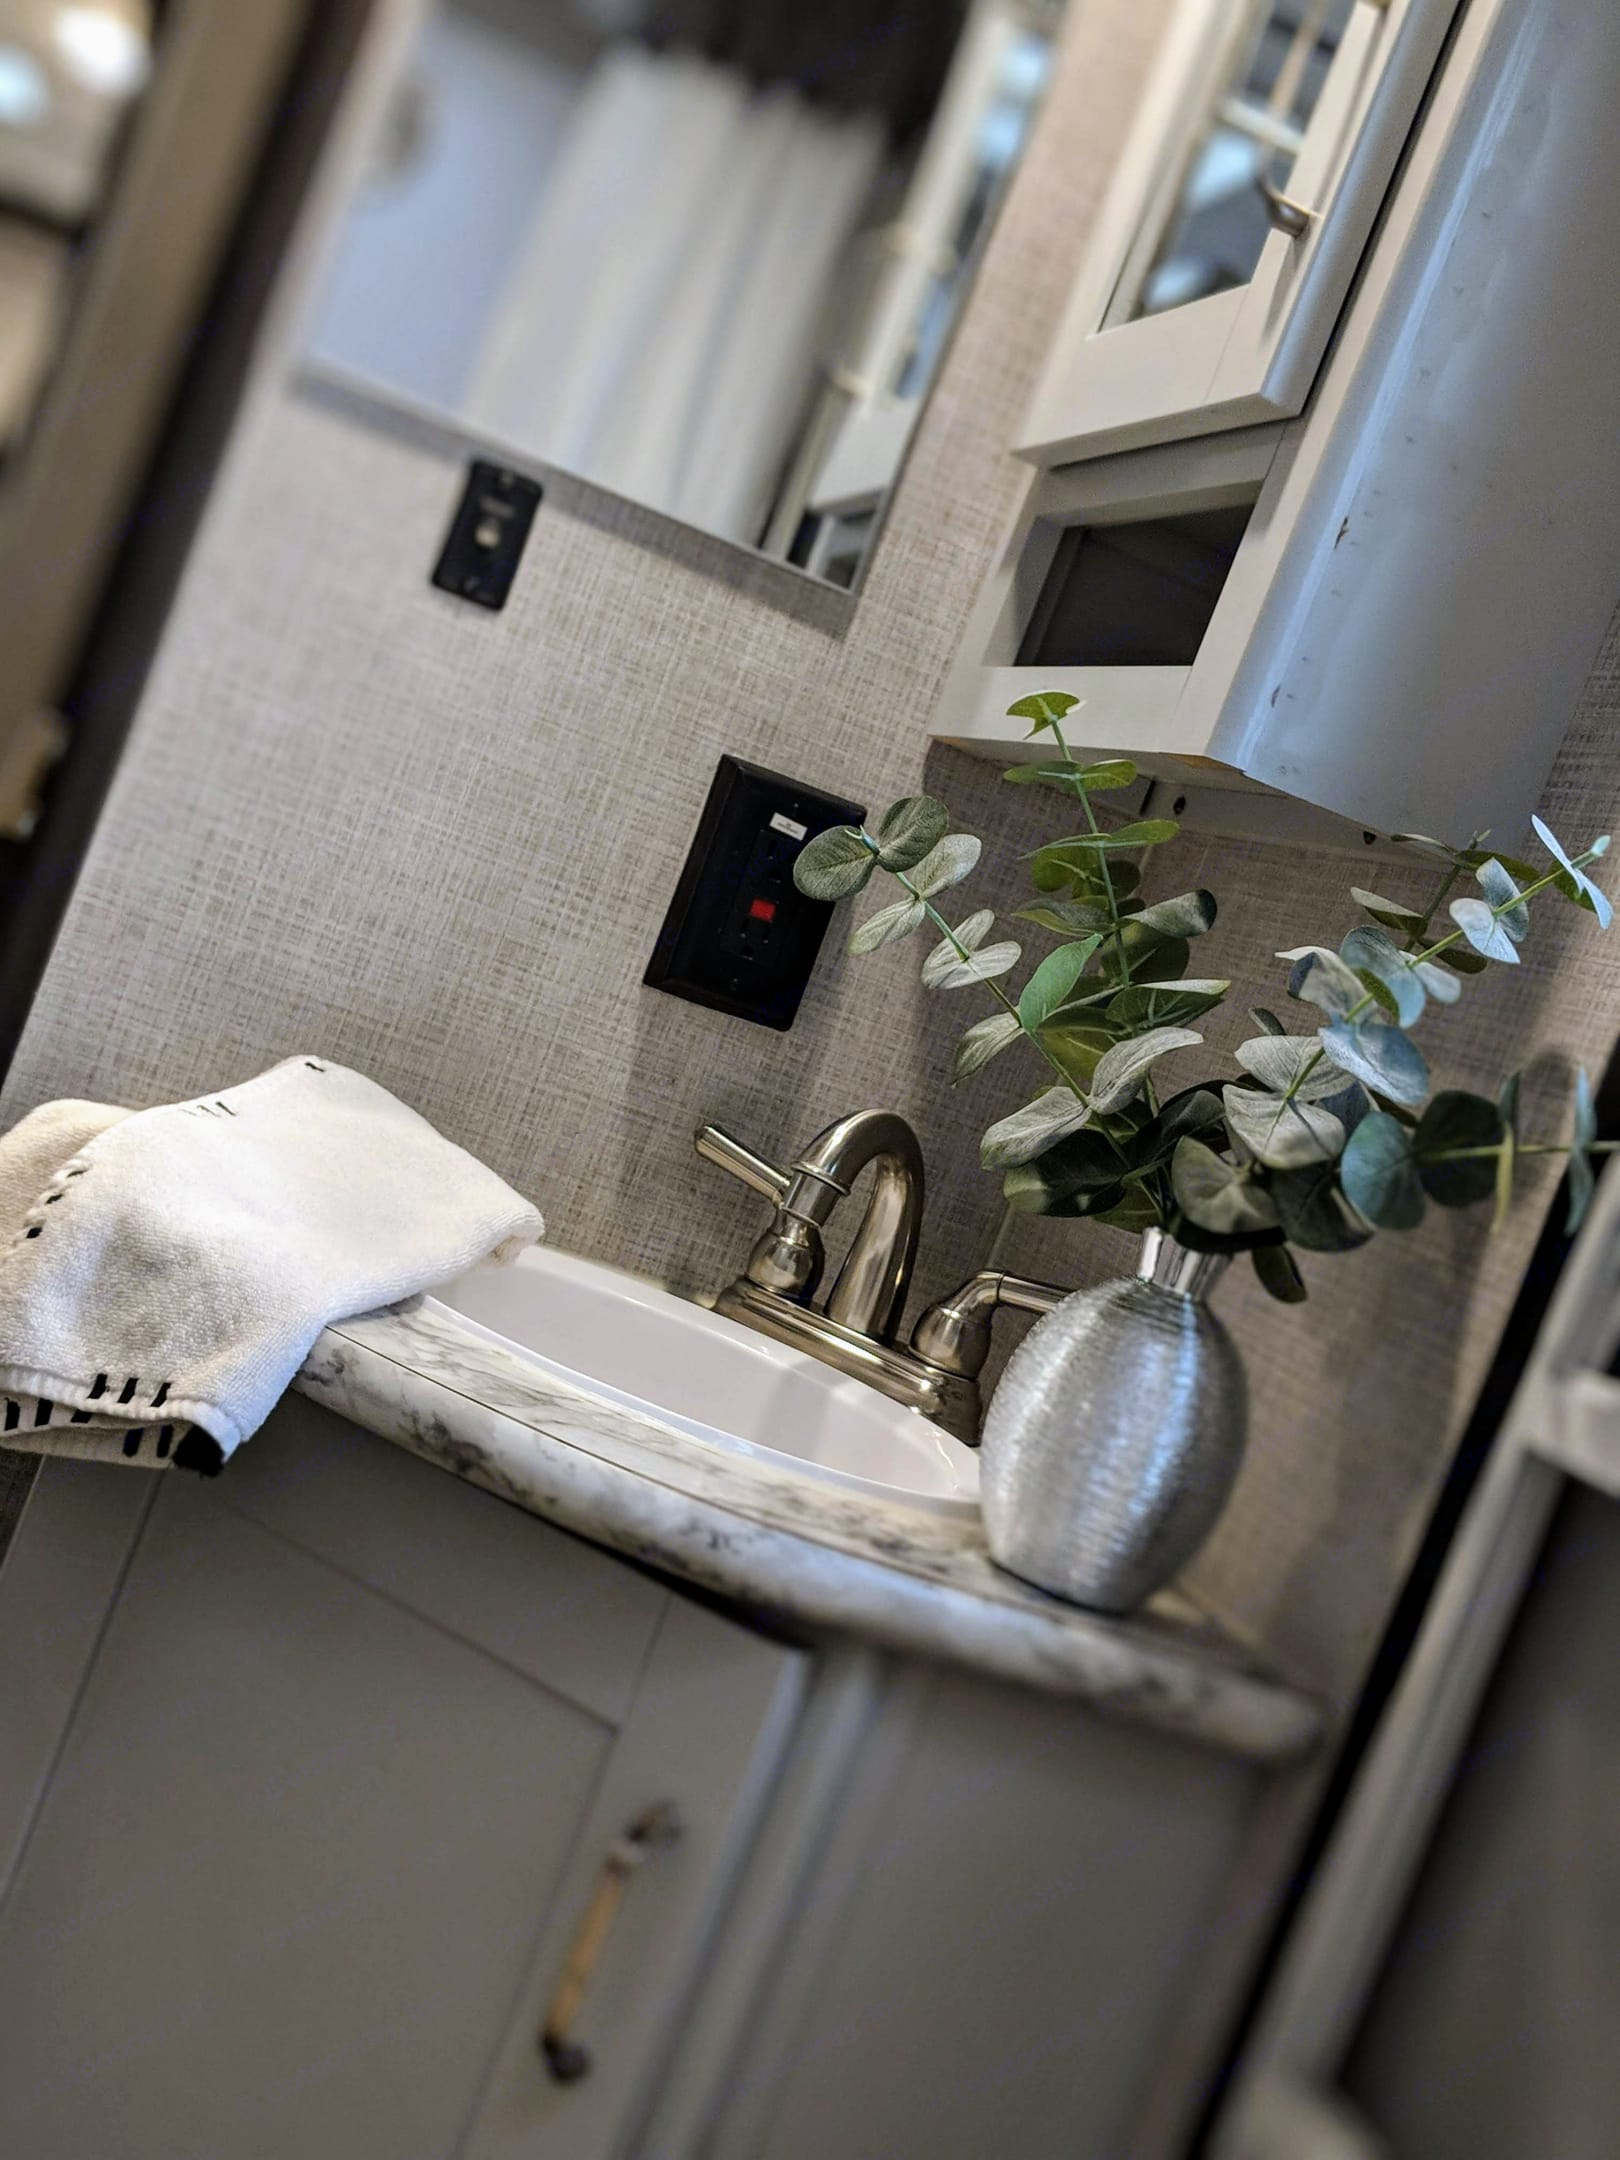 Bathroom Sink. Keystone Bullet 2020